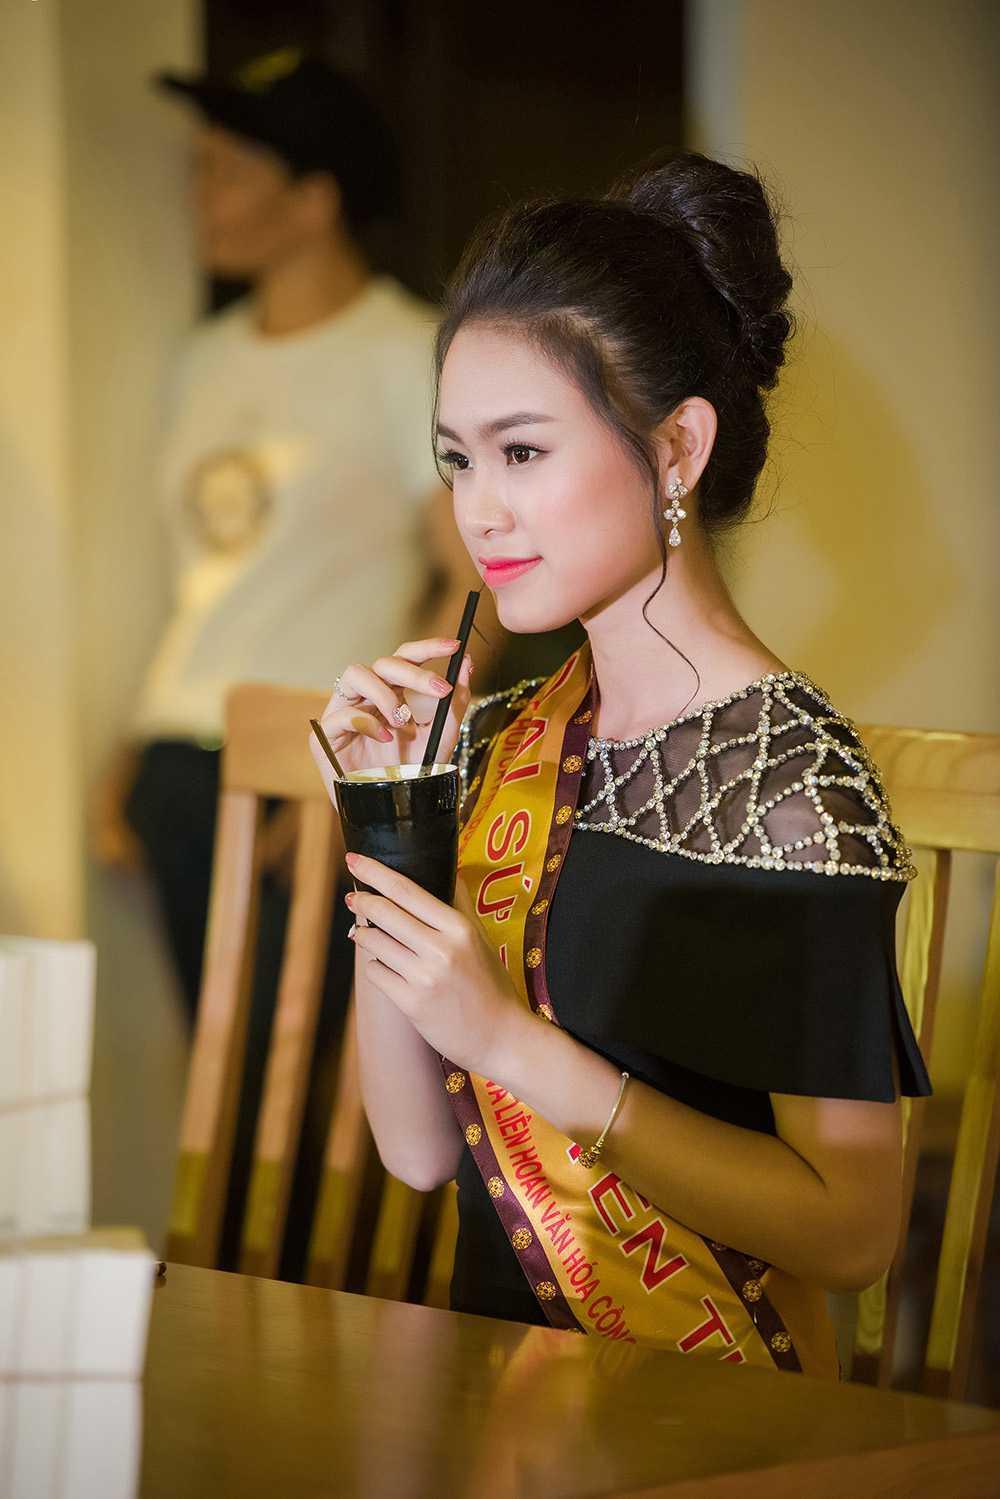 'Co gai vang' cua Hoa hau Viet Nam quyen ru o Le hoi ca phe hinh anh 8